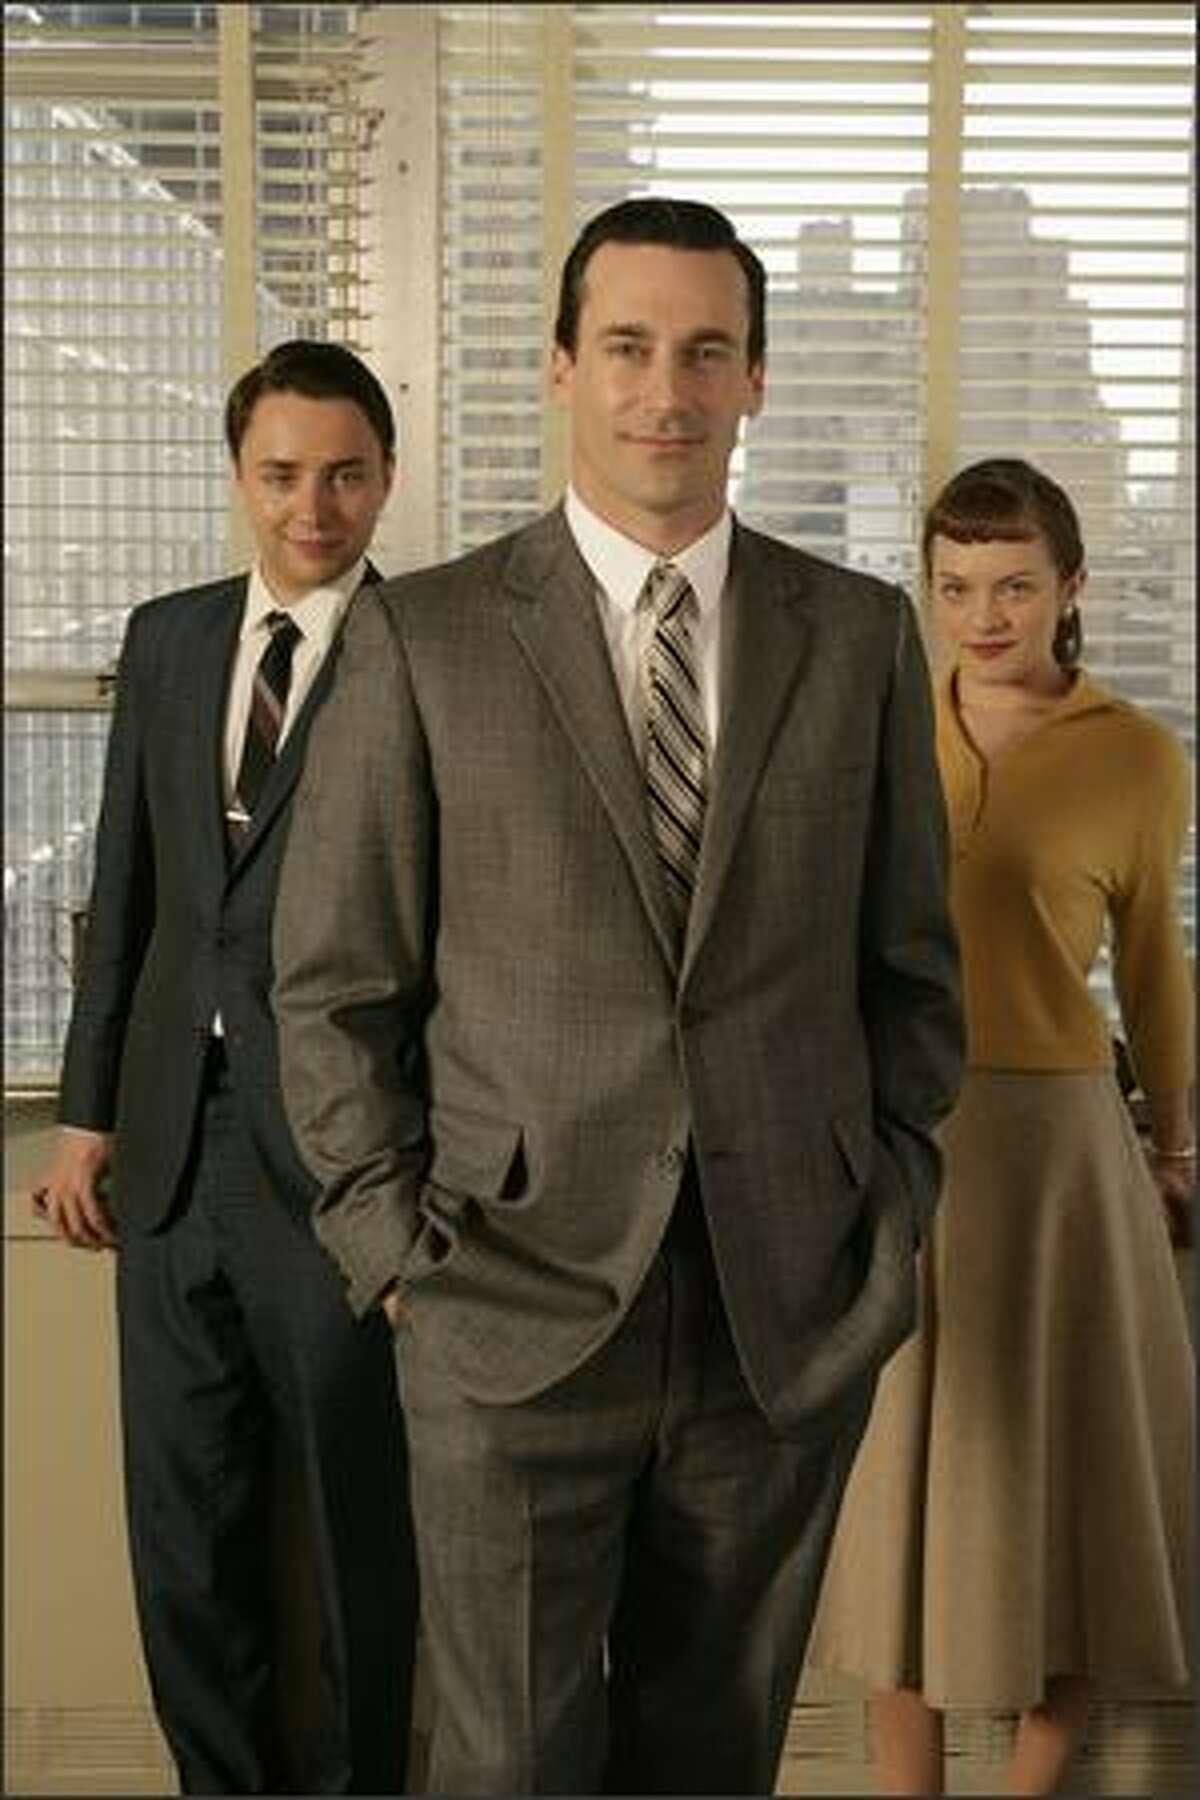 Vincent Kartheiser, Jon Hamm and Elisabeth Moss star in the AMC drama series